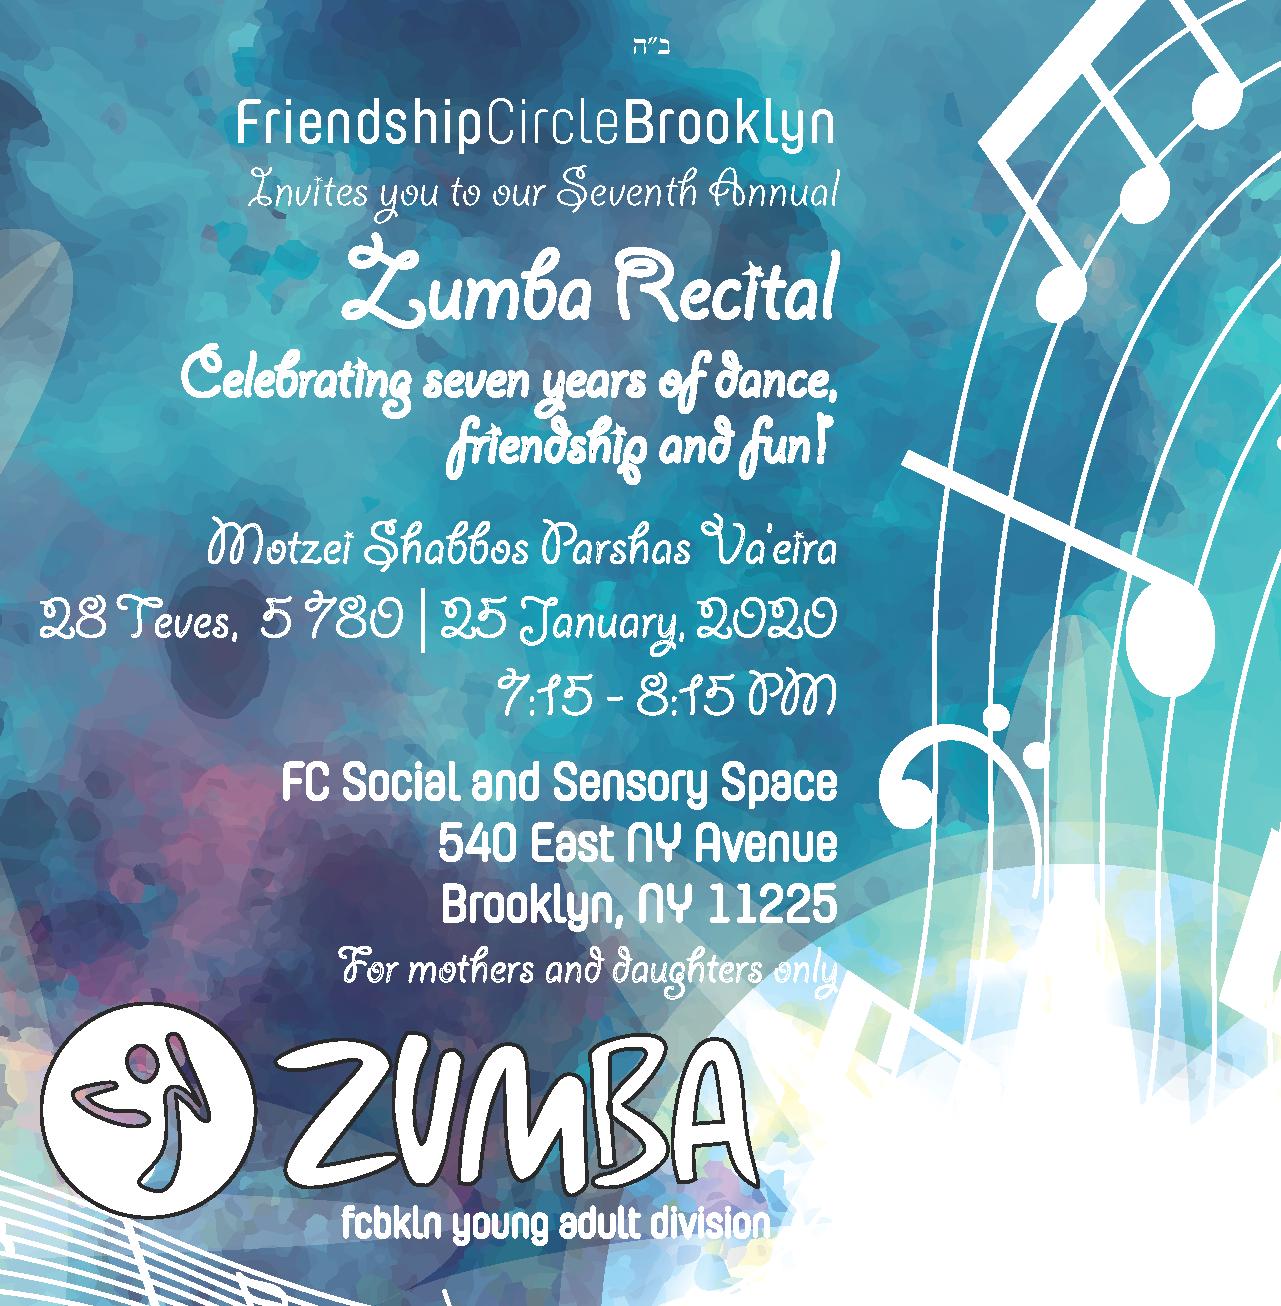 Zumba Recital 5780